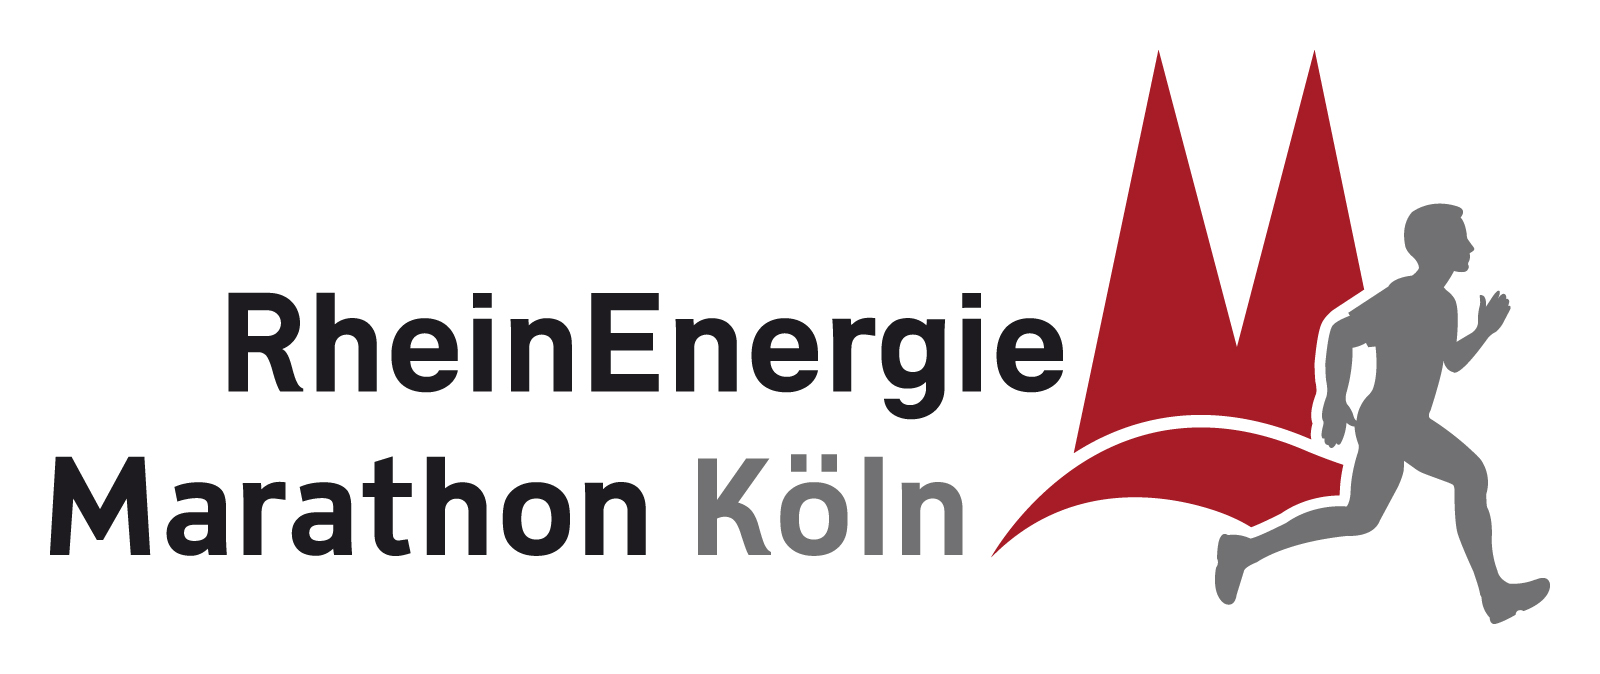 marathon2014_logo_full_vh10_RGB